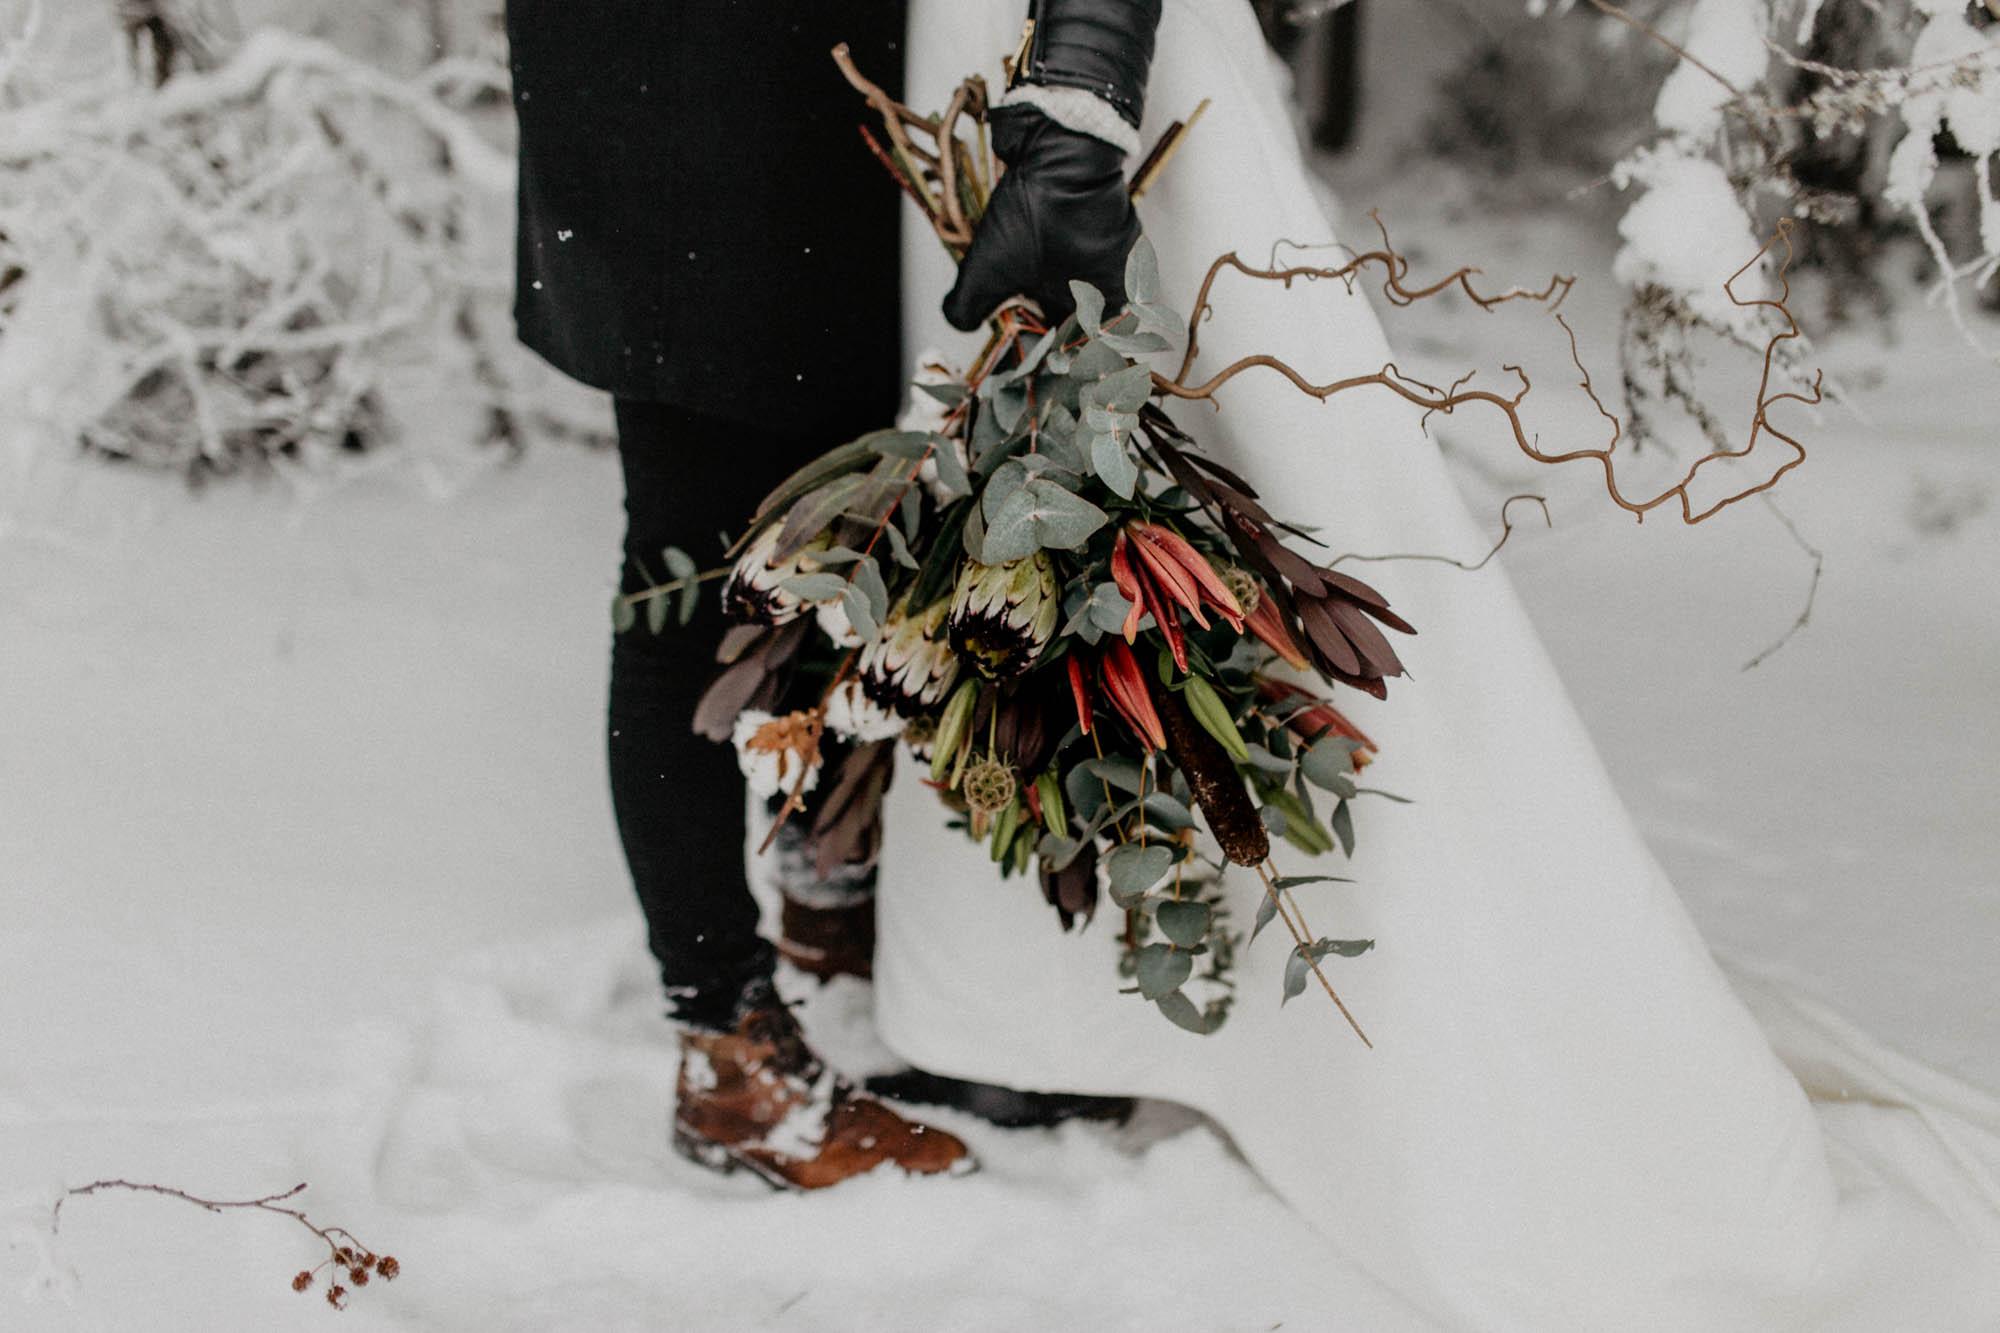 ashley_schulman_photography-winter_wedding_tampere-9.jpg